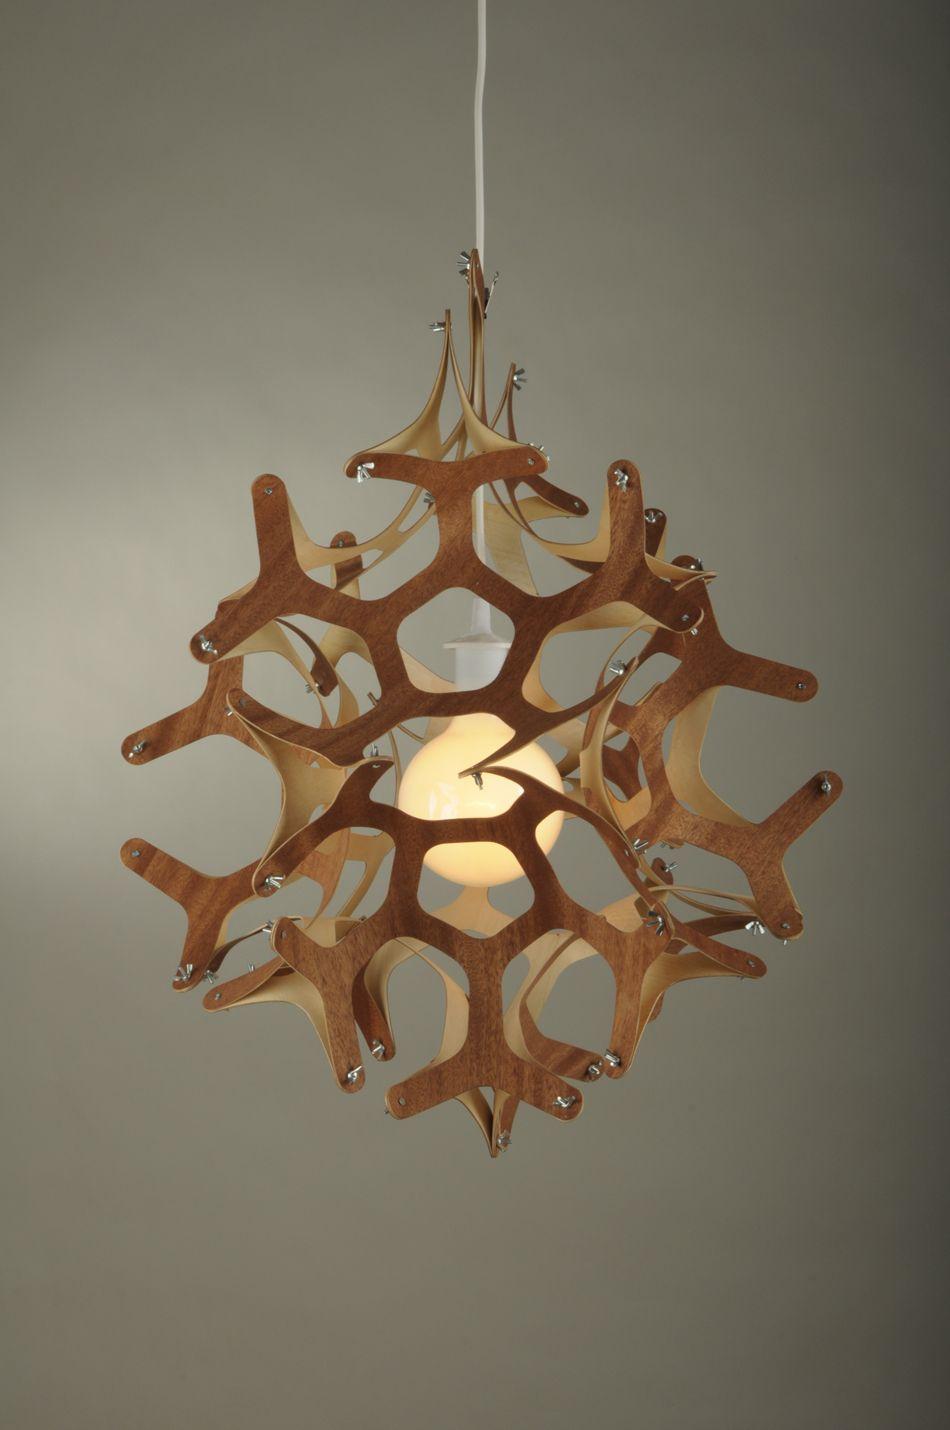 Lighting design and art by Pavel Eekra room Pinterest